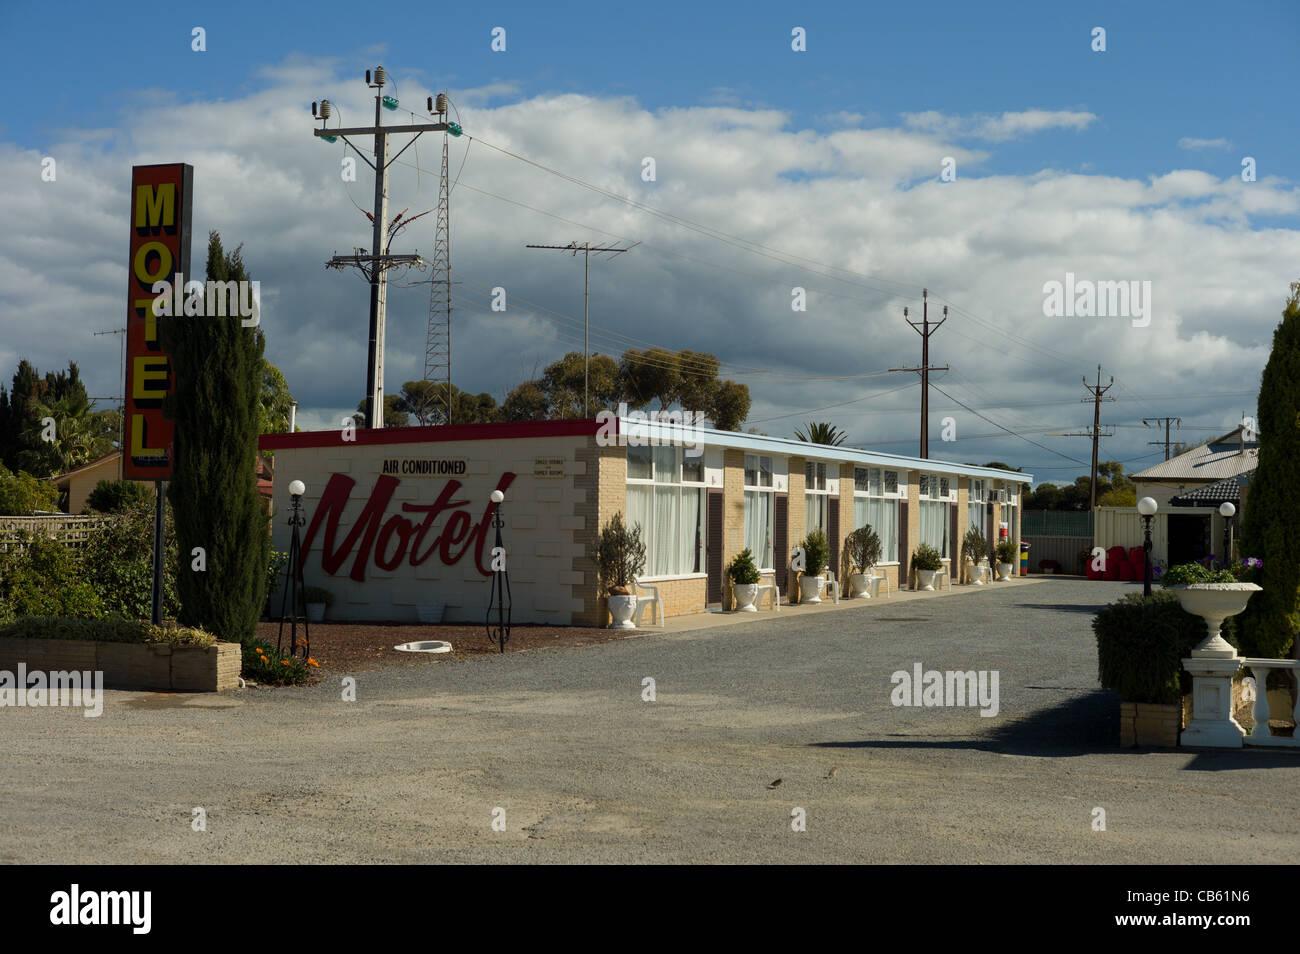 50's/60's American Drive in Style Roadside Hotel Motel Australia - Stock Image